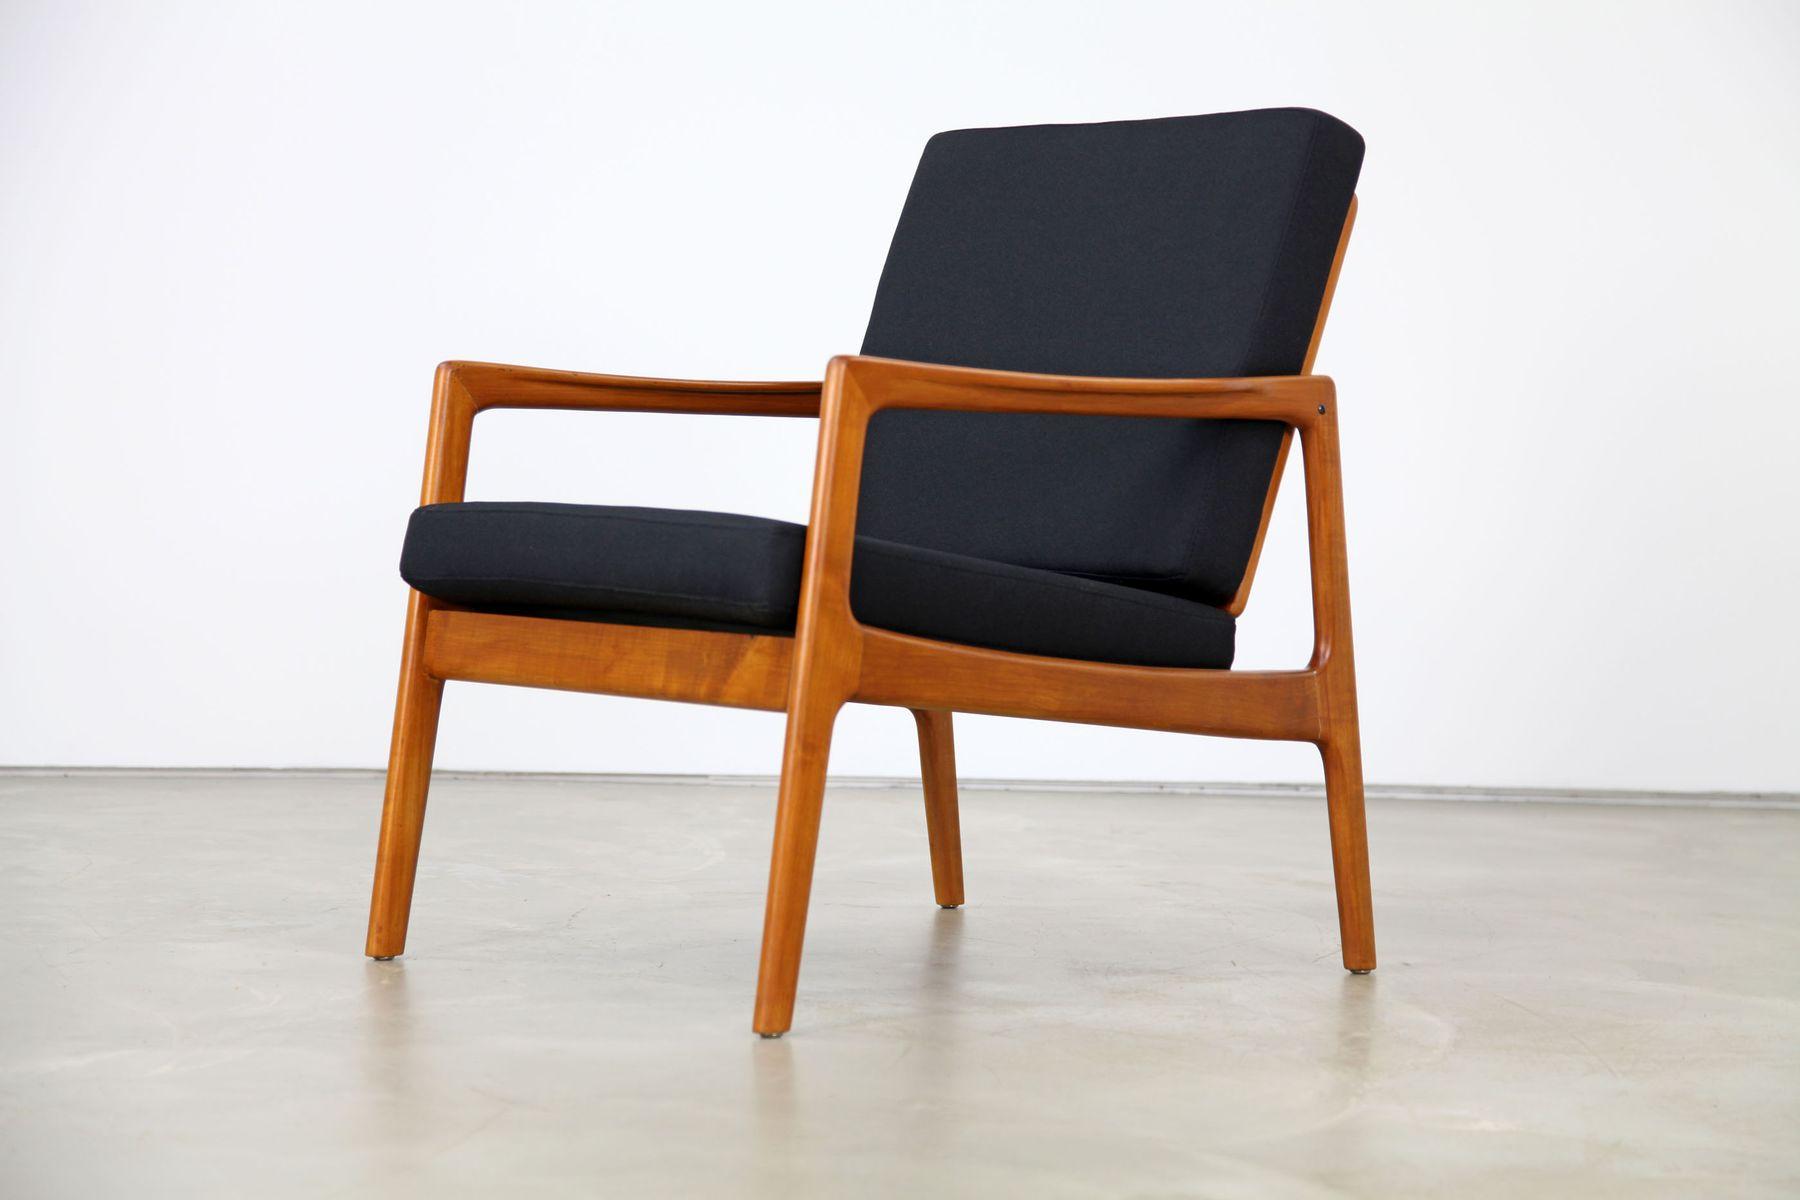 danish modern sessel 1960er bei pamono kaufen. Black Bedroom Furniture Sets. Home Design Ideas